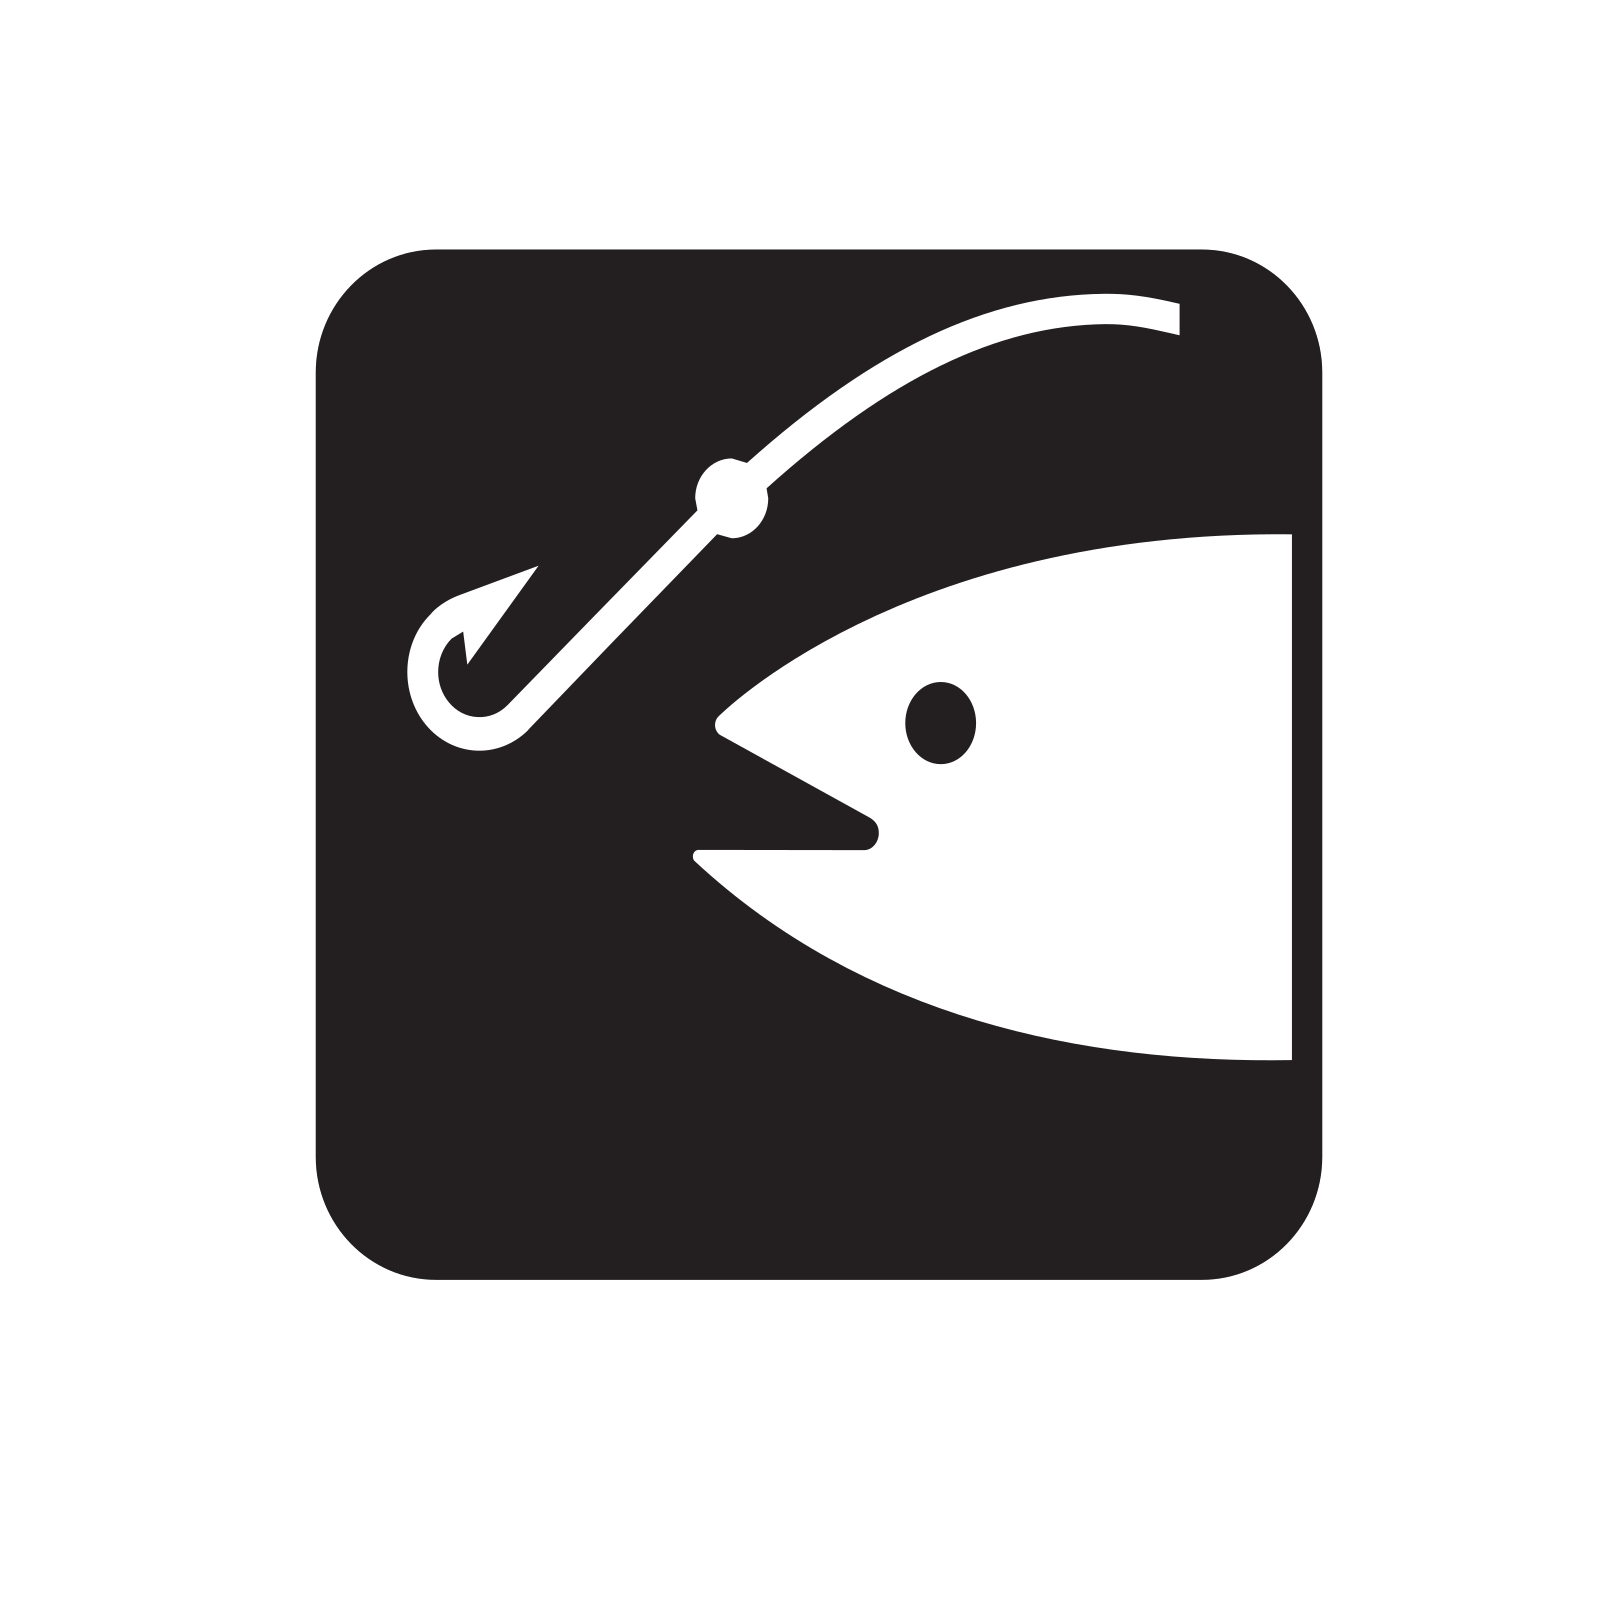 Download Fishing Svg Vector Fishing Clip Art Svg Clipart